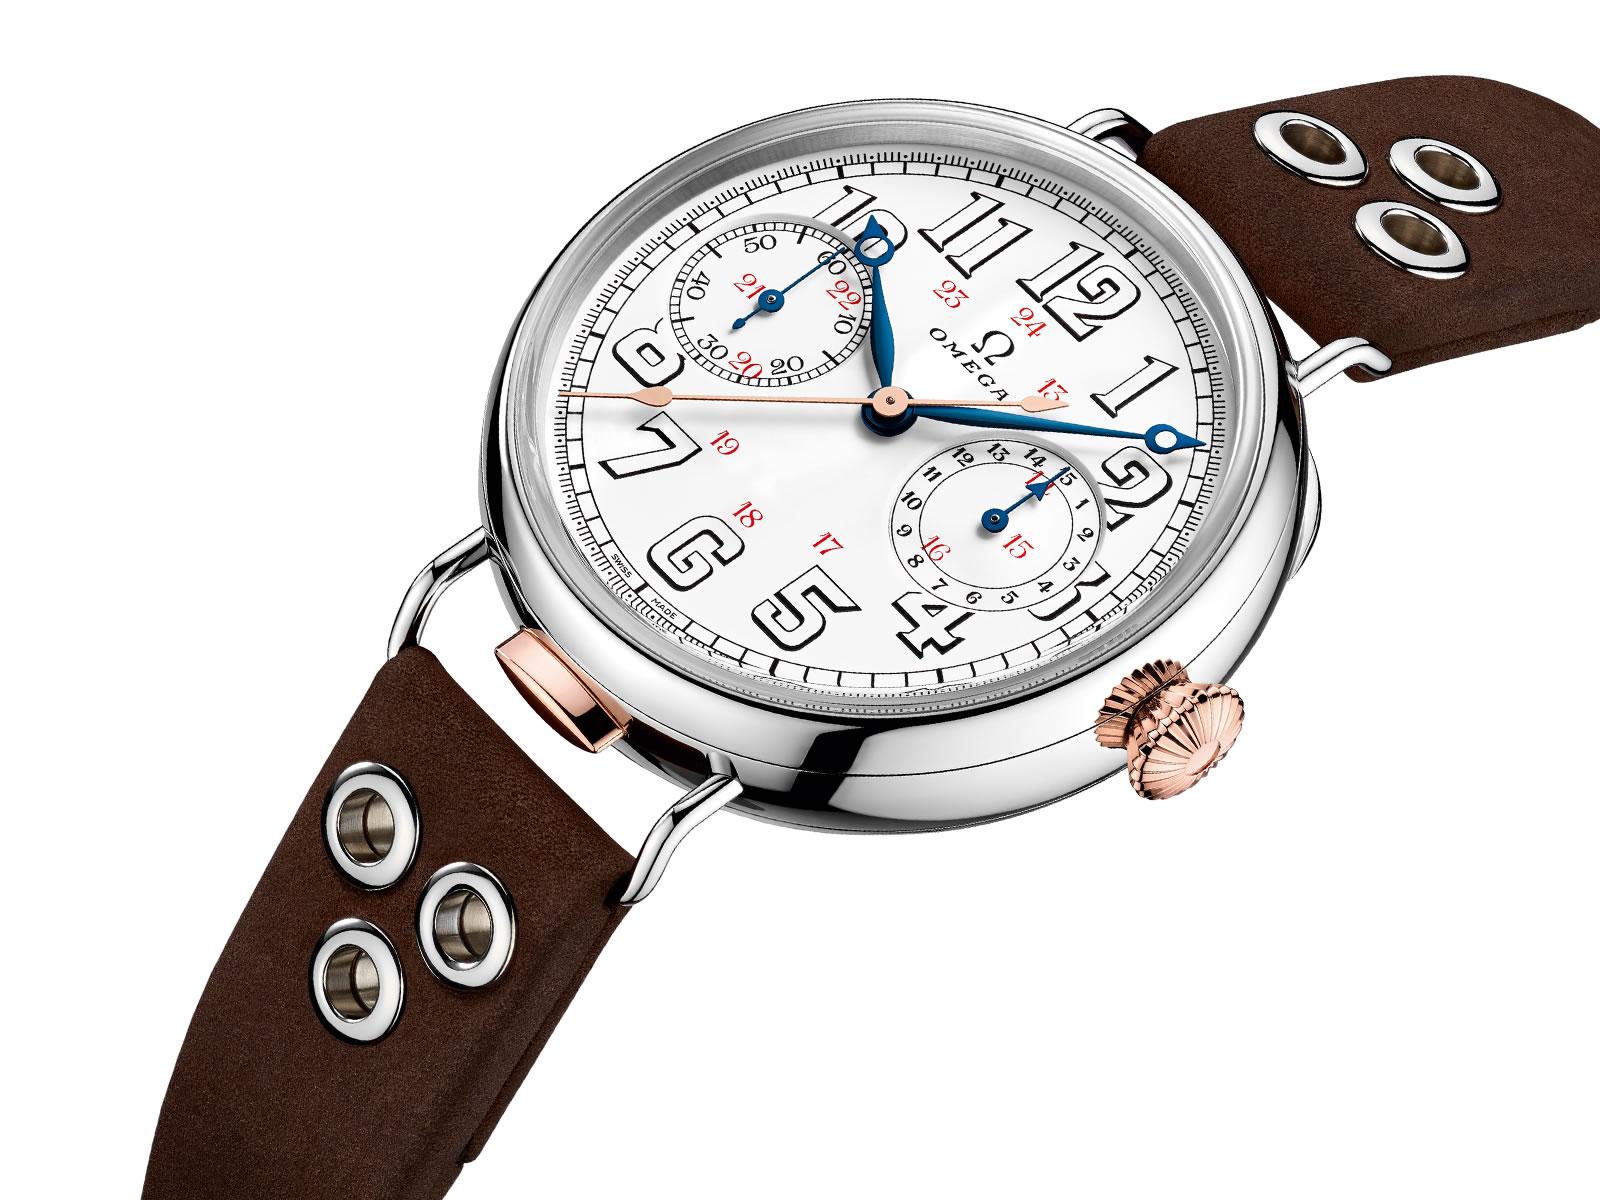 516-52-48-30-04-001-omega-18-chro-wrist-chronograph-limited-edition-7.jpg